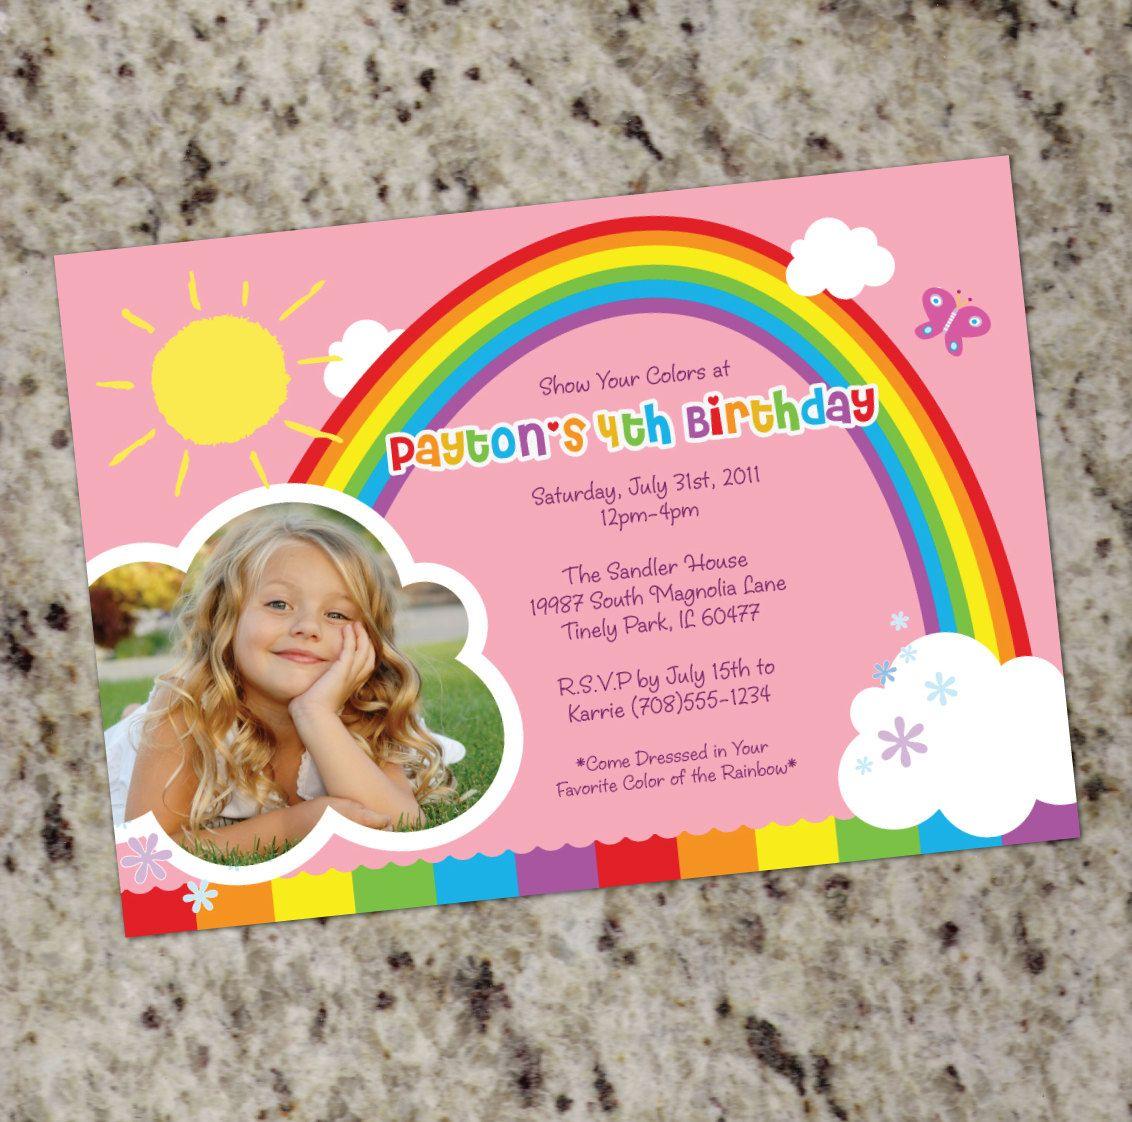 RAINBOW PARTY Birthday Party Invitations Printable Design